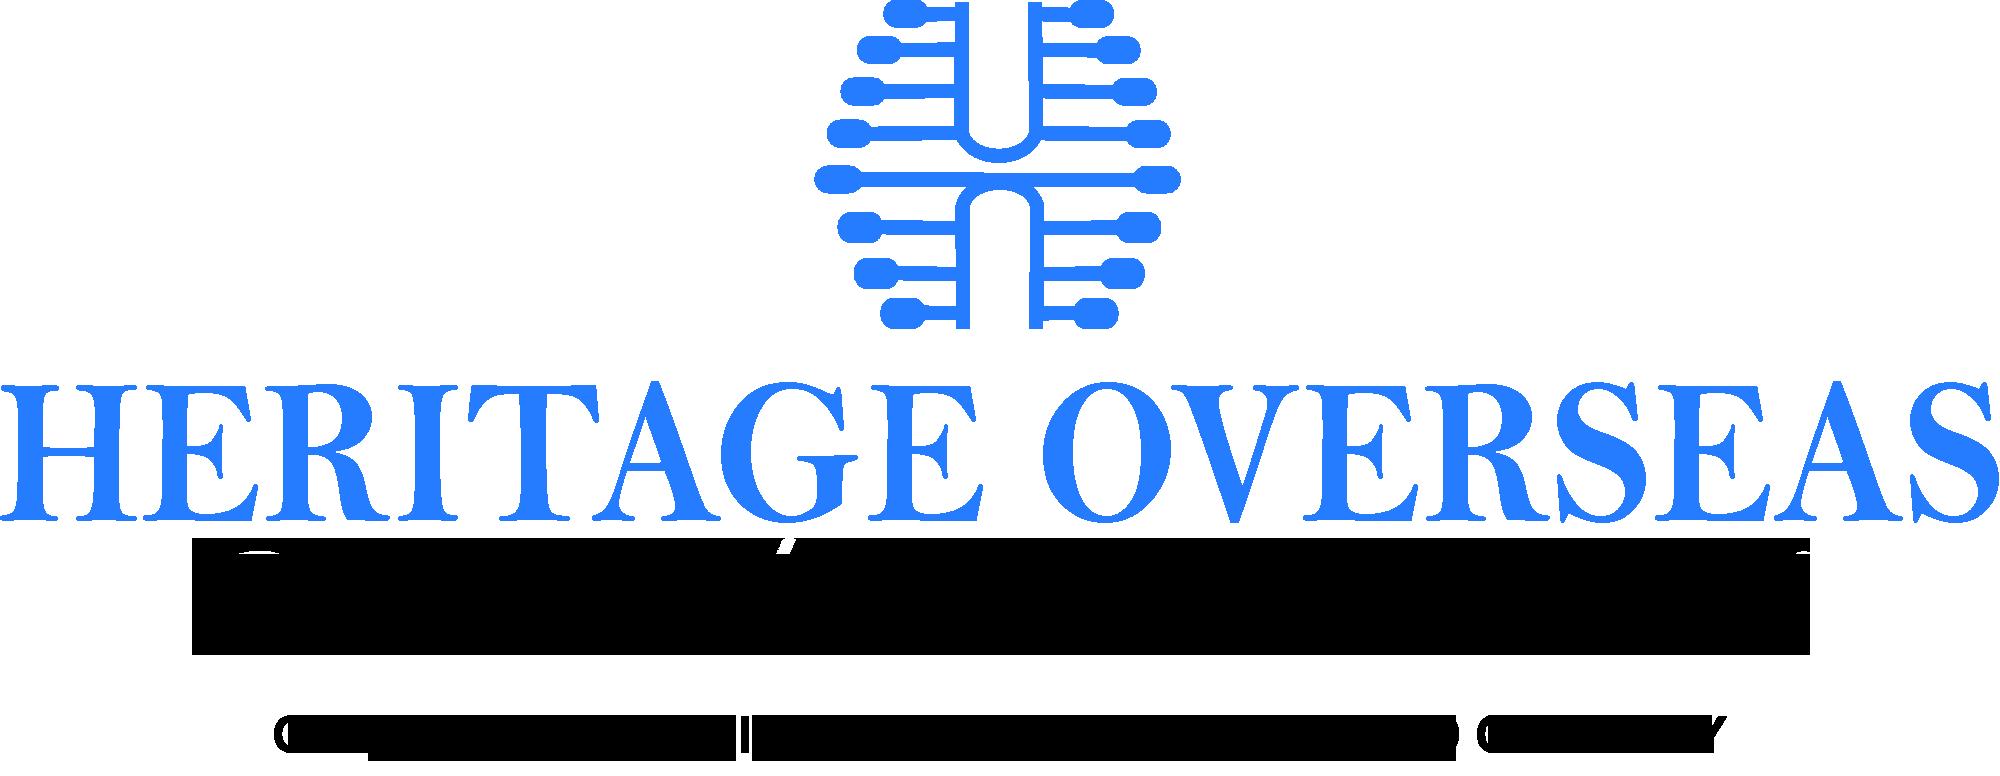 Heritage Overseas